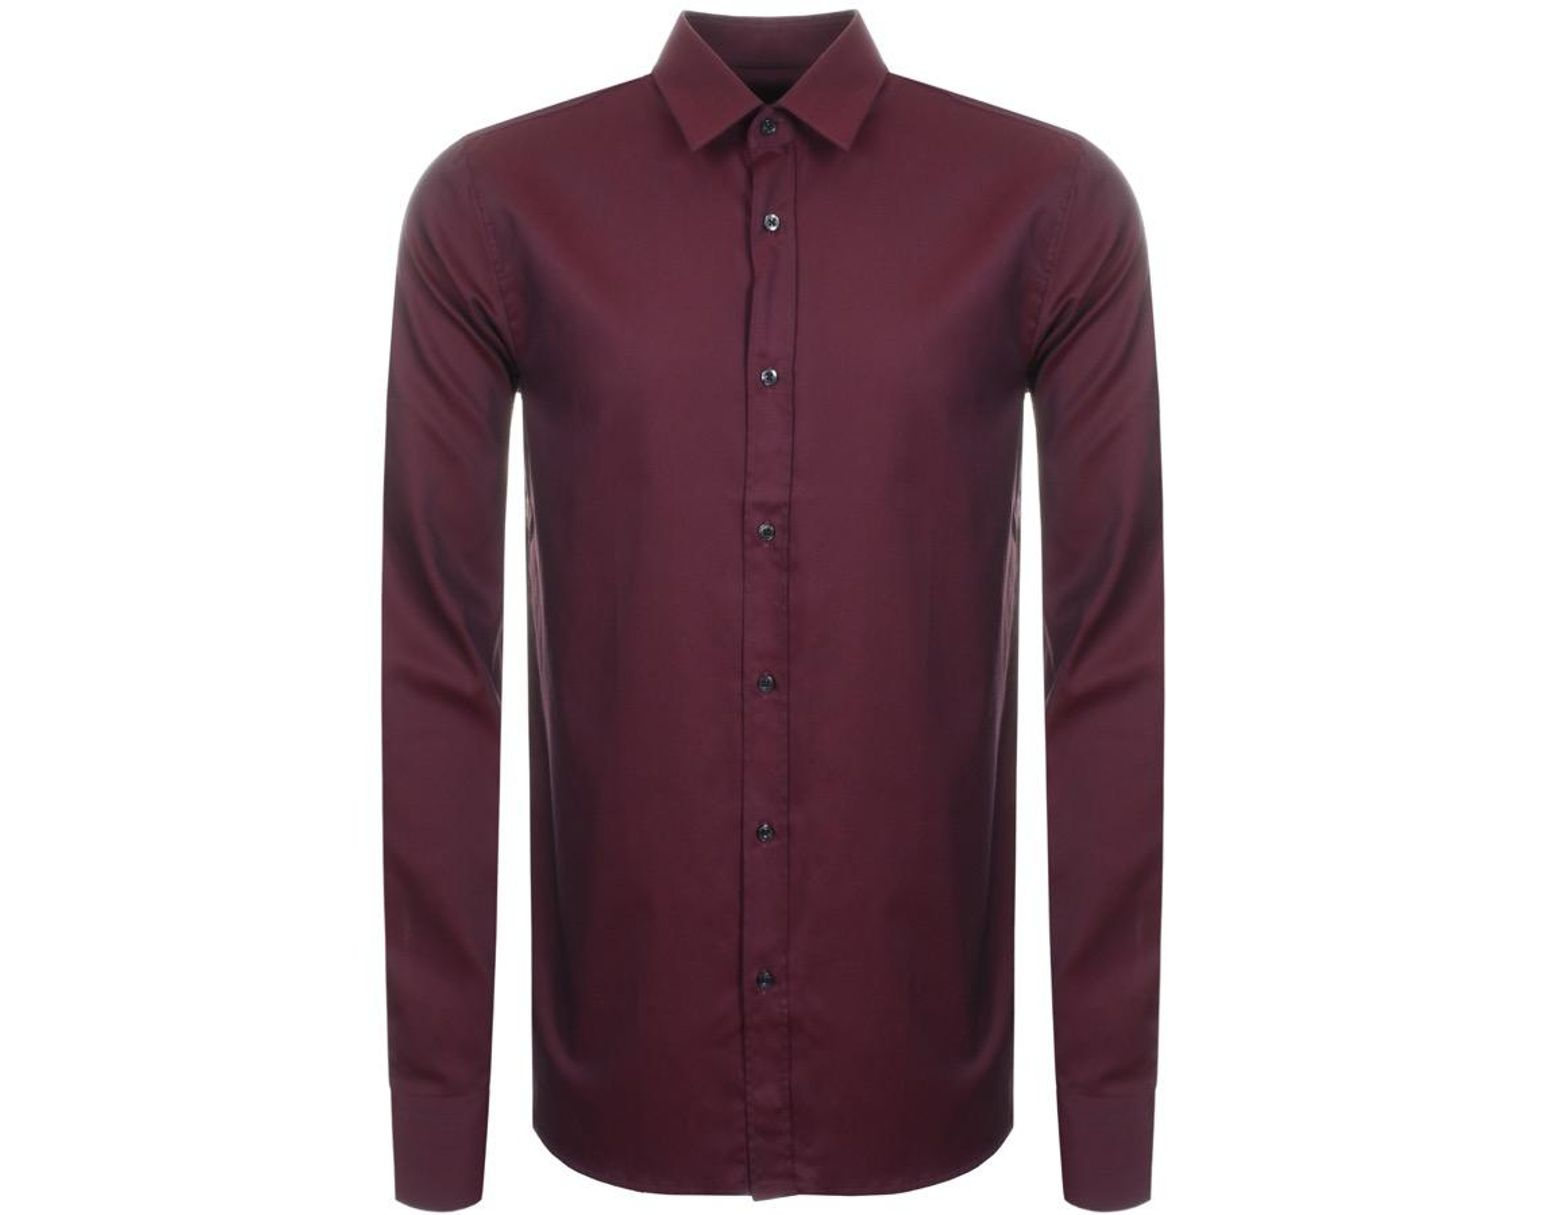 c1c5c6b8 HUGO Elisha 01 Shirt Burgundy in Purple for Men - Lyst